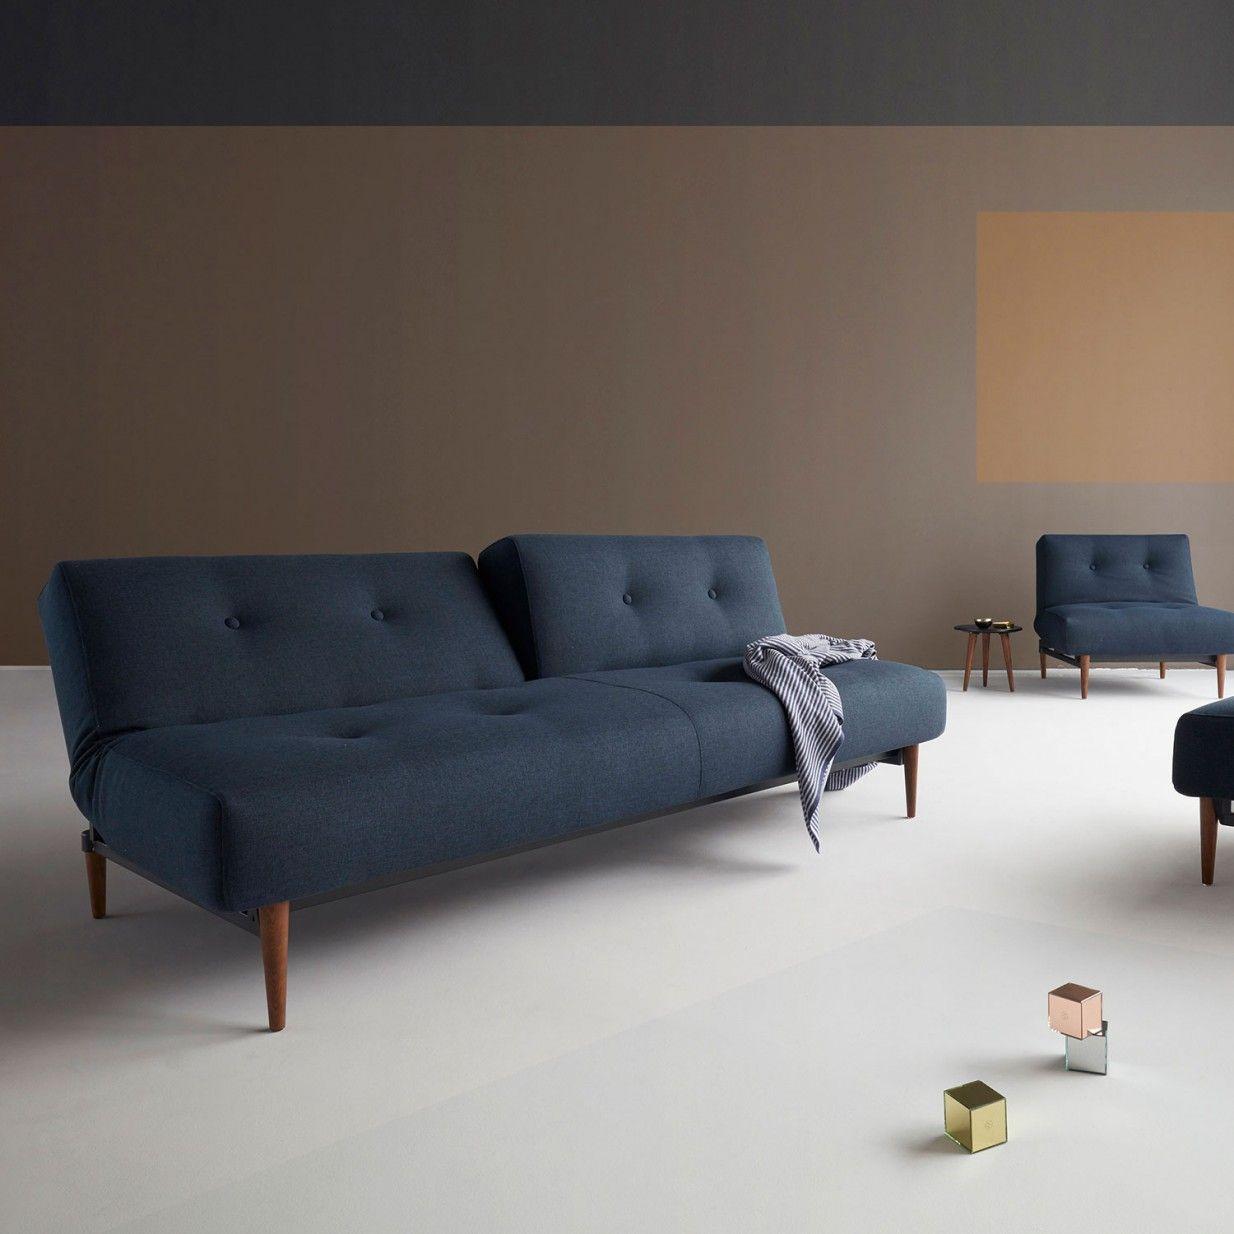 Schlafsofa Blau buri schlafsofa blau innovation living pomysły do domu